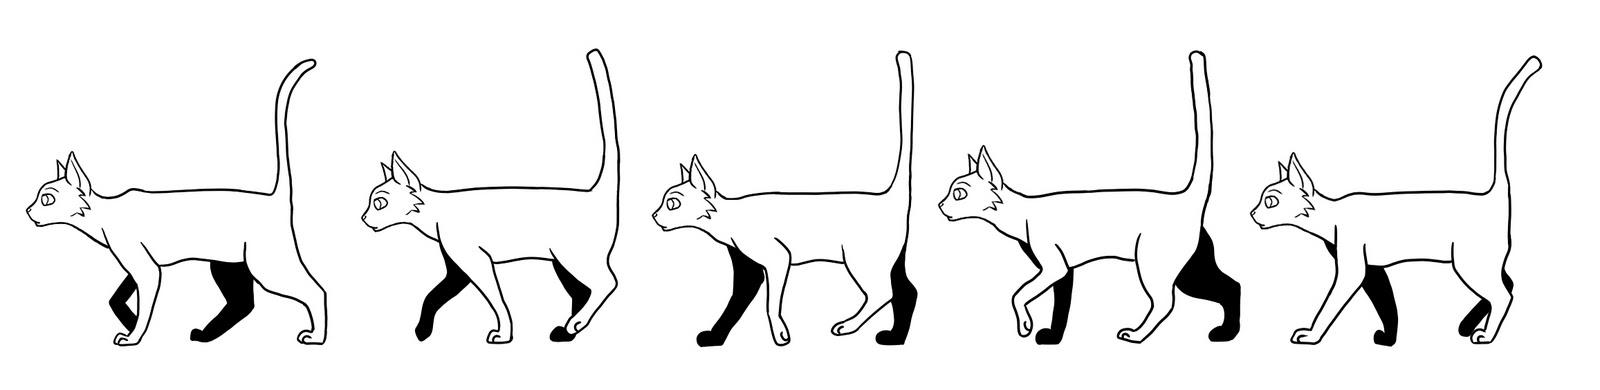 Elegant Walk Cat Animation